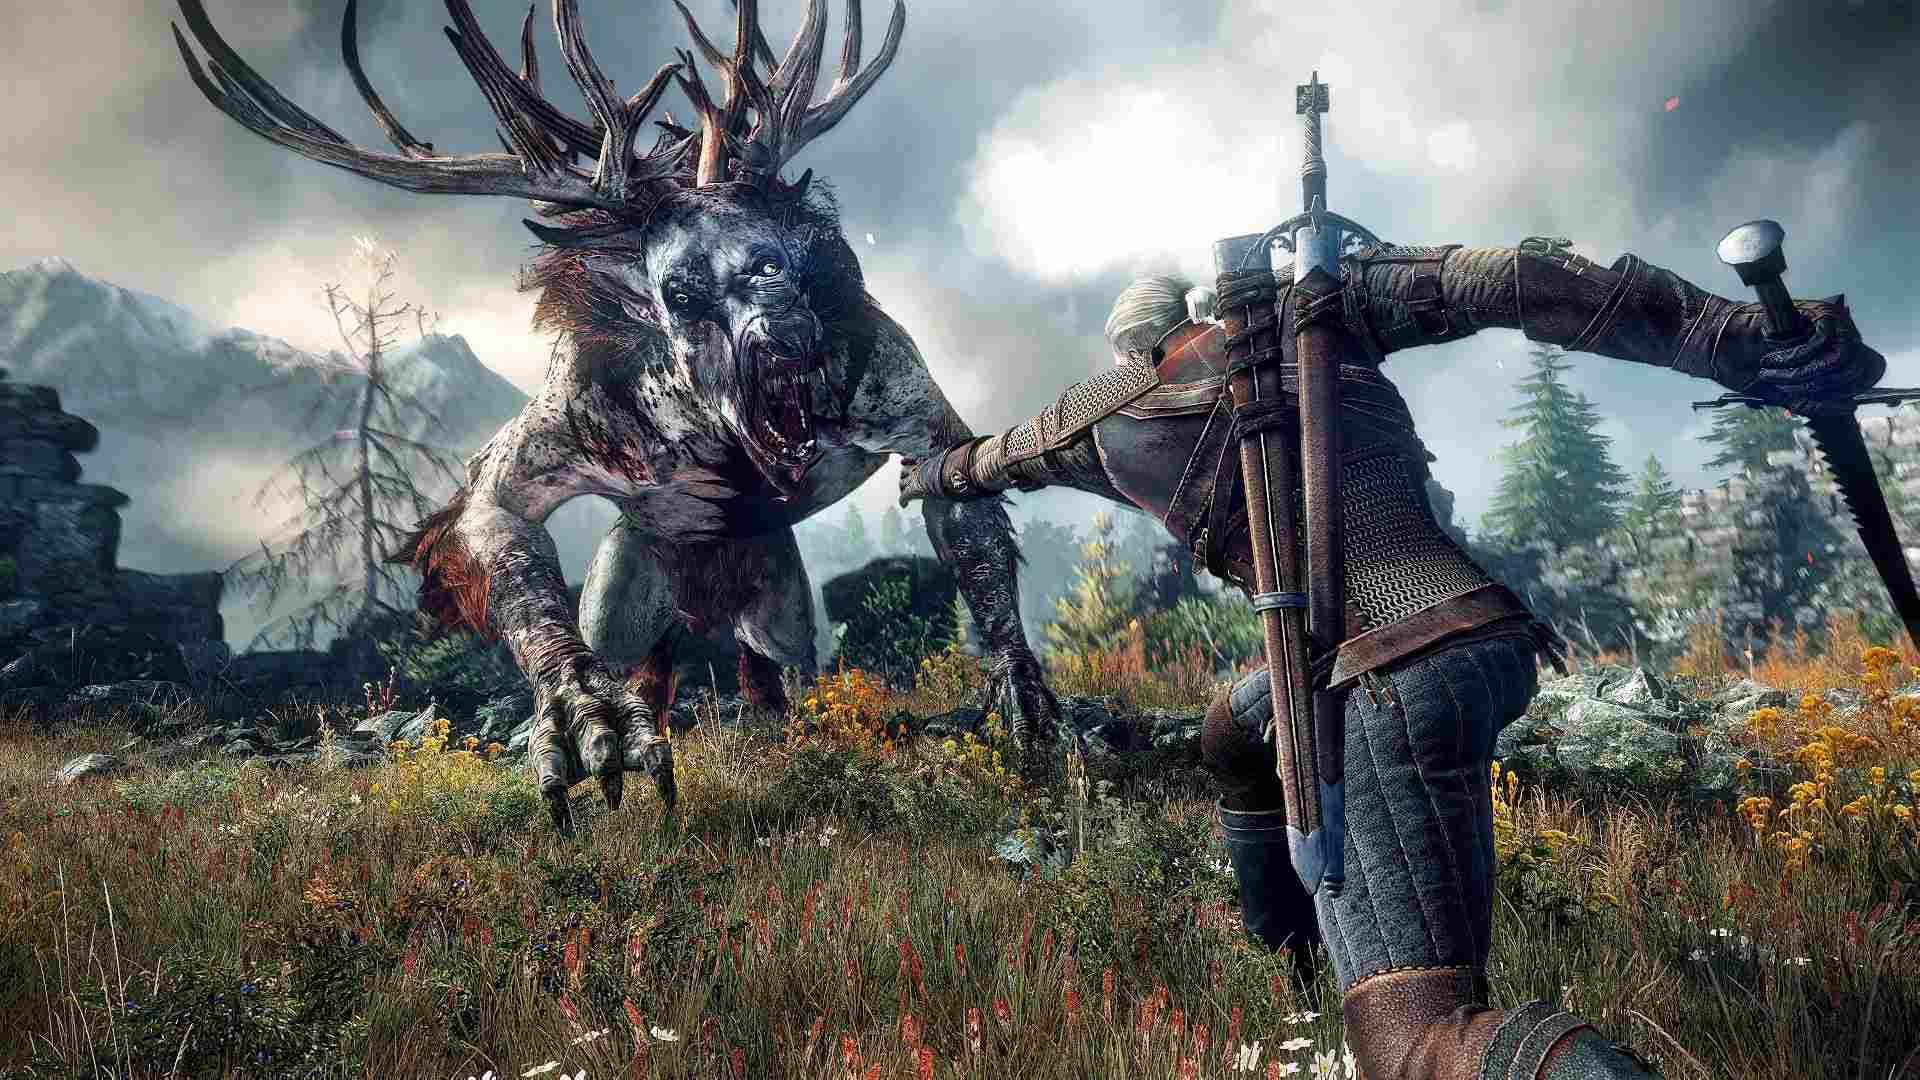 Best PC games/ Best Graphics games/Best PC games 2018 2019